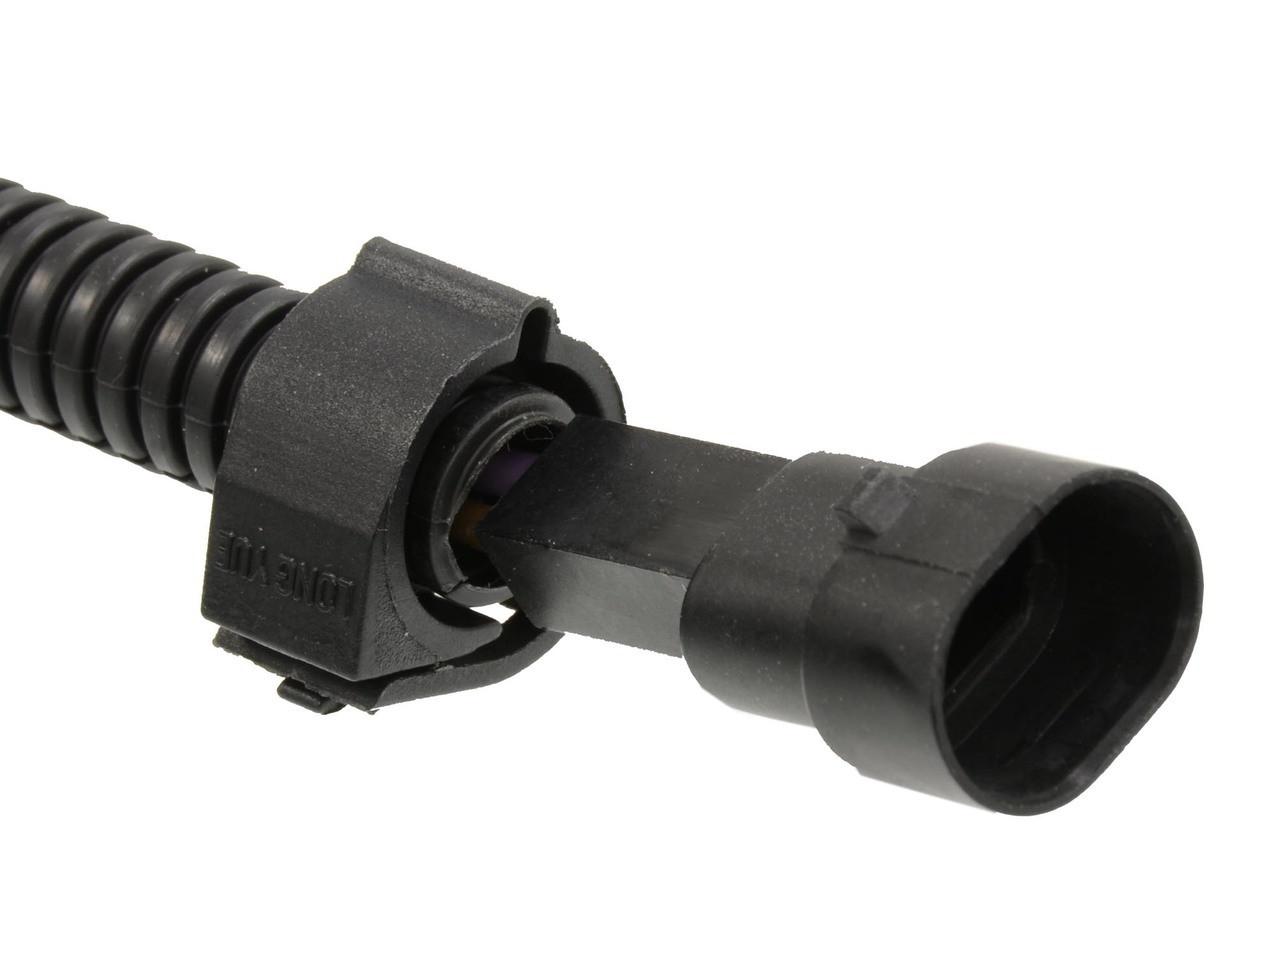 hight resolution of intake air temp iat mat sensor wire harness extension 22 fits gm ls1 lt1